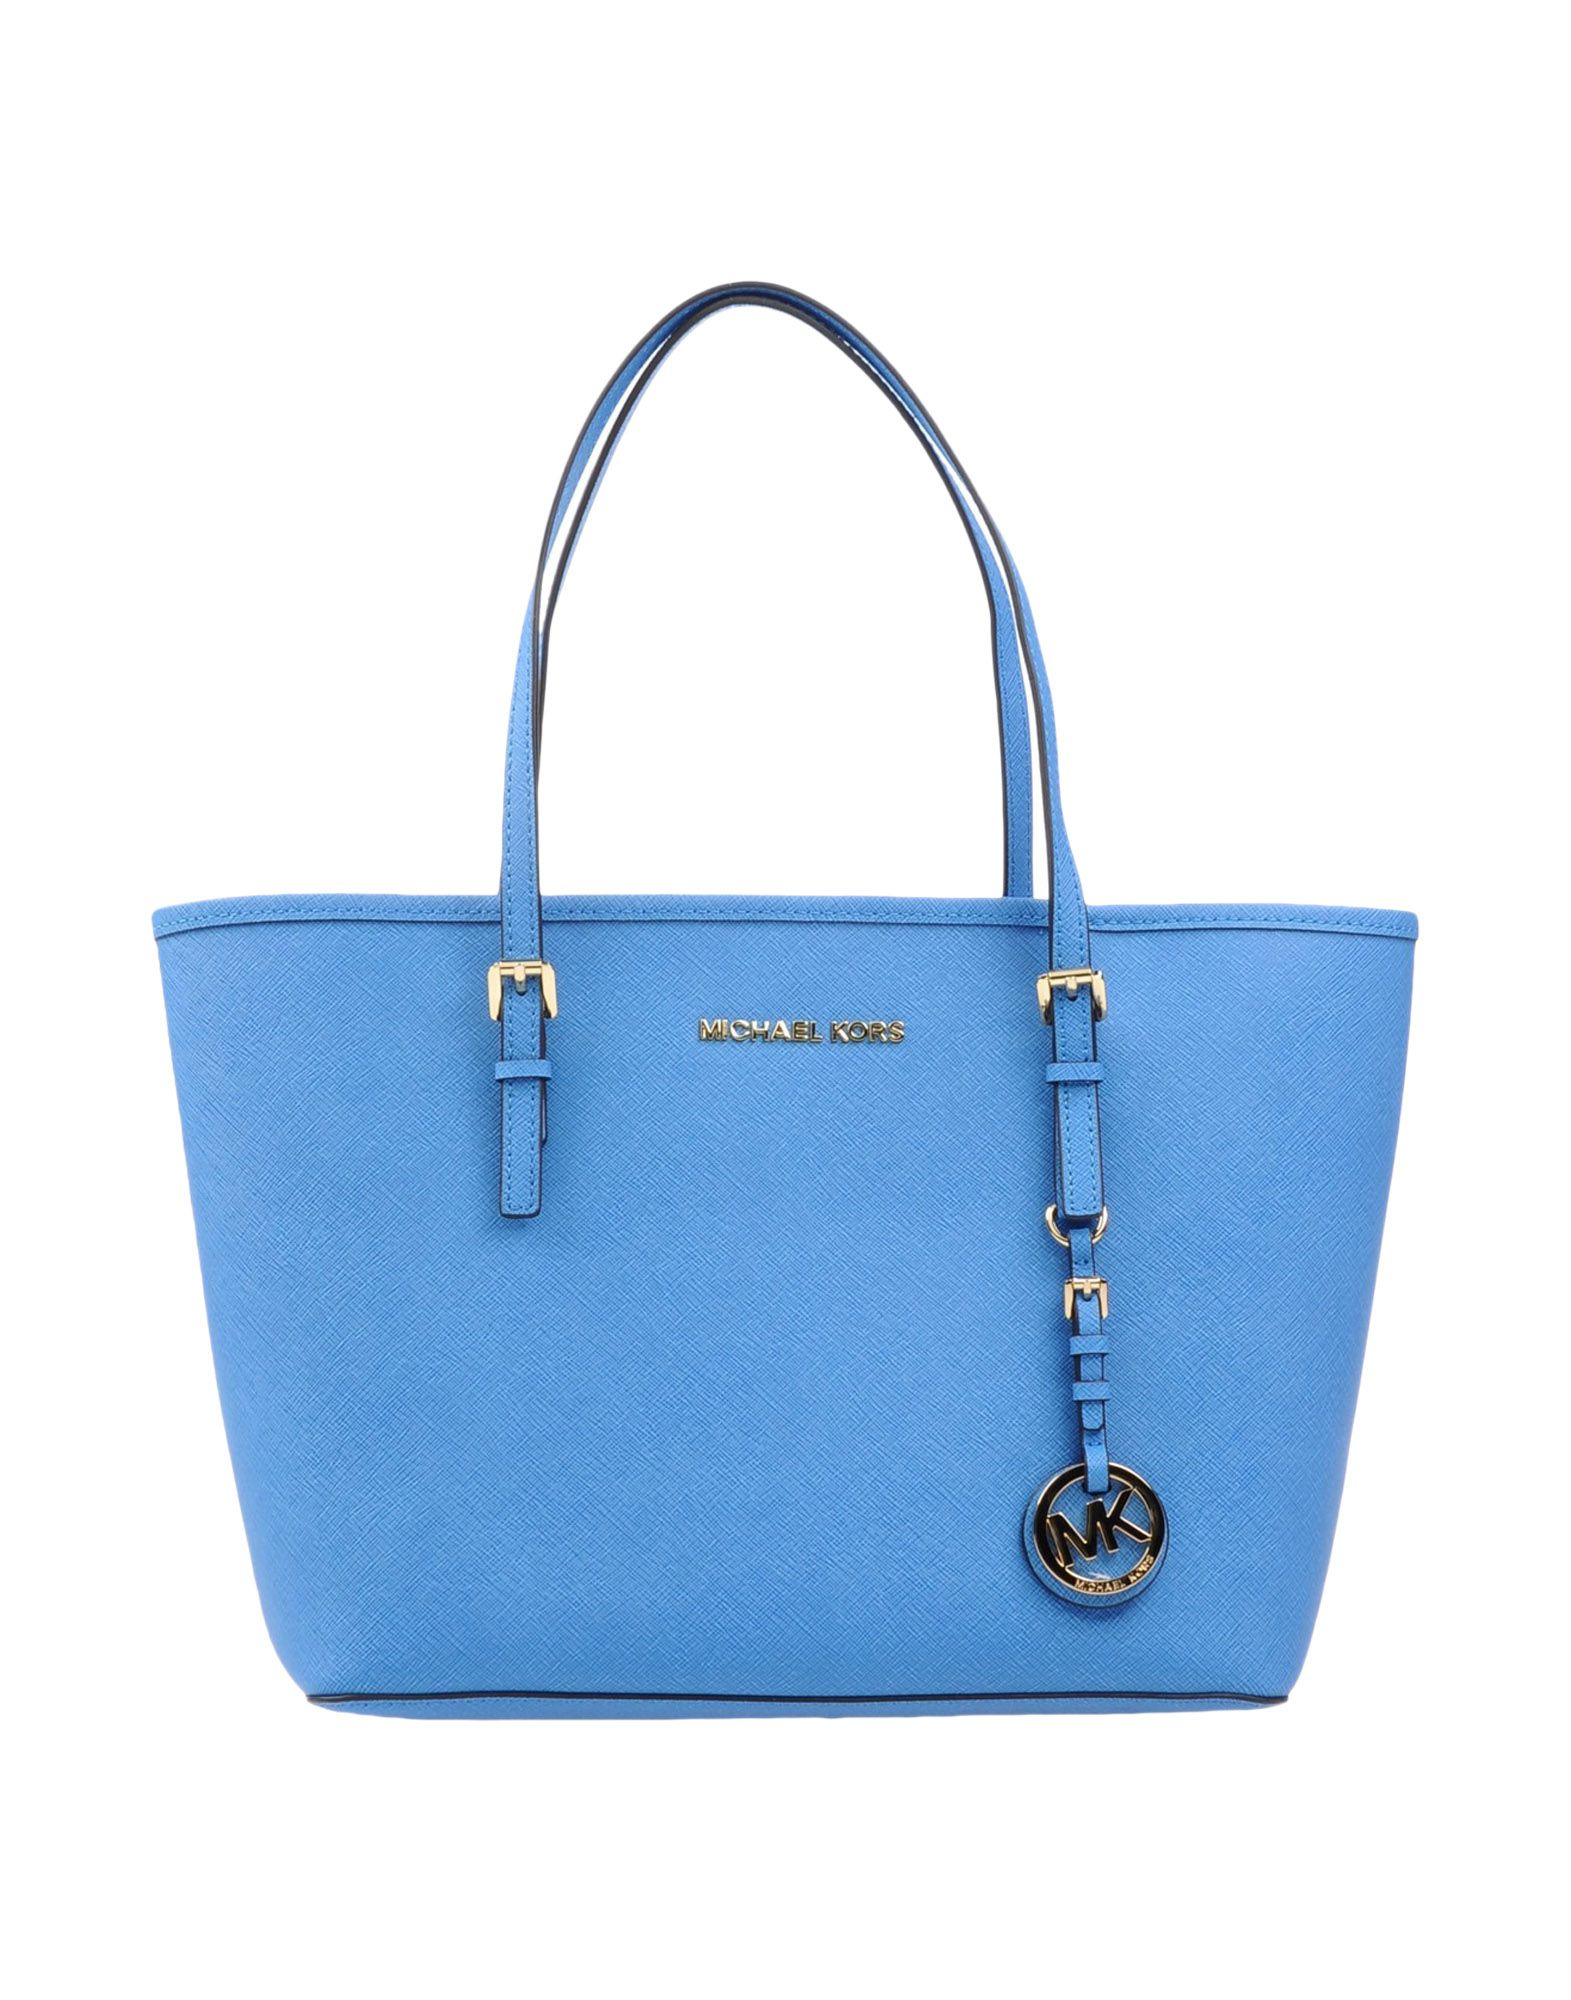 Michael Kors Handbags Blue Color